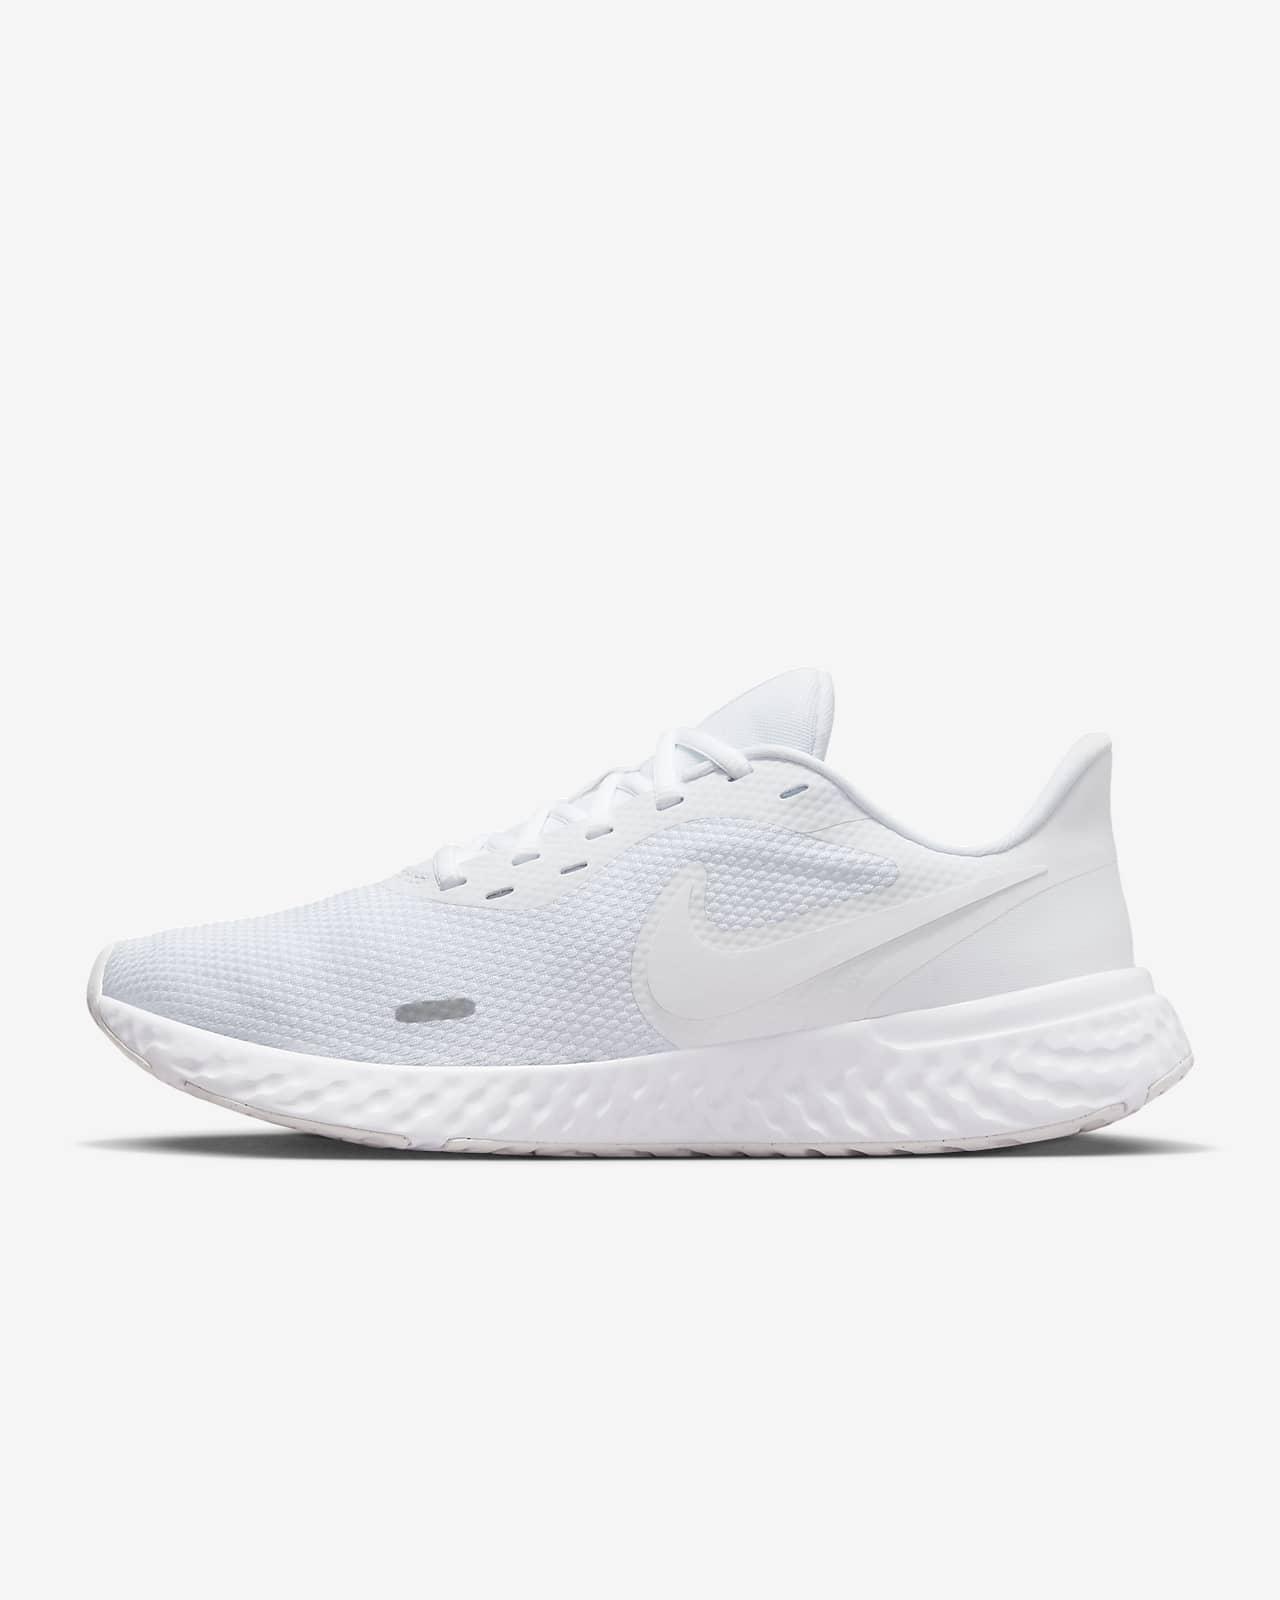 Chaussures de running Nike Revolution 5 pour Homme